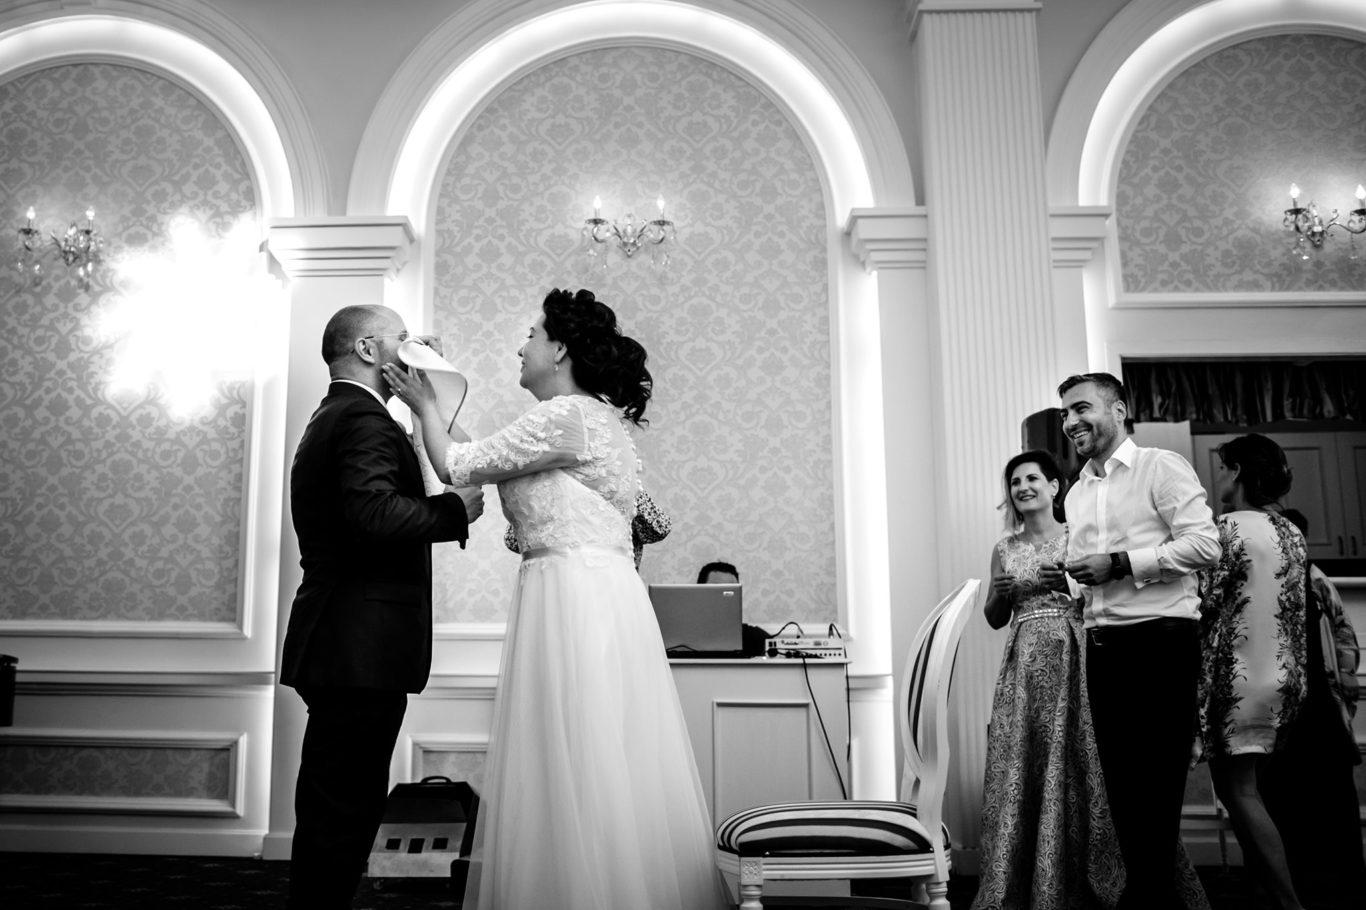 0749-fotografie-nunta-bucuresti-anca-george-fotograf-ciprian-dumitrescu-dcf_6237